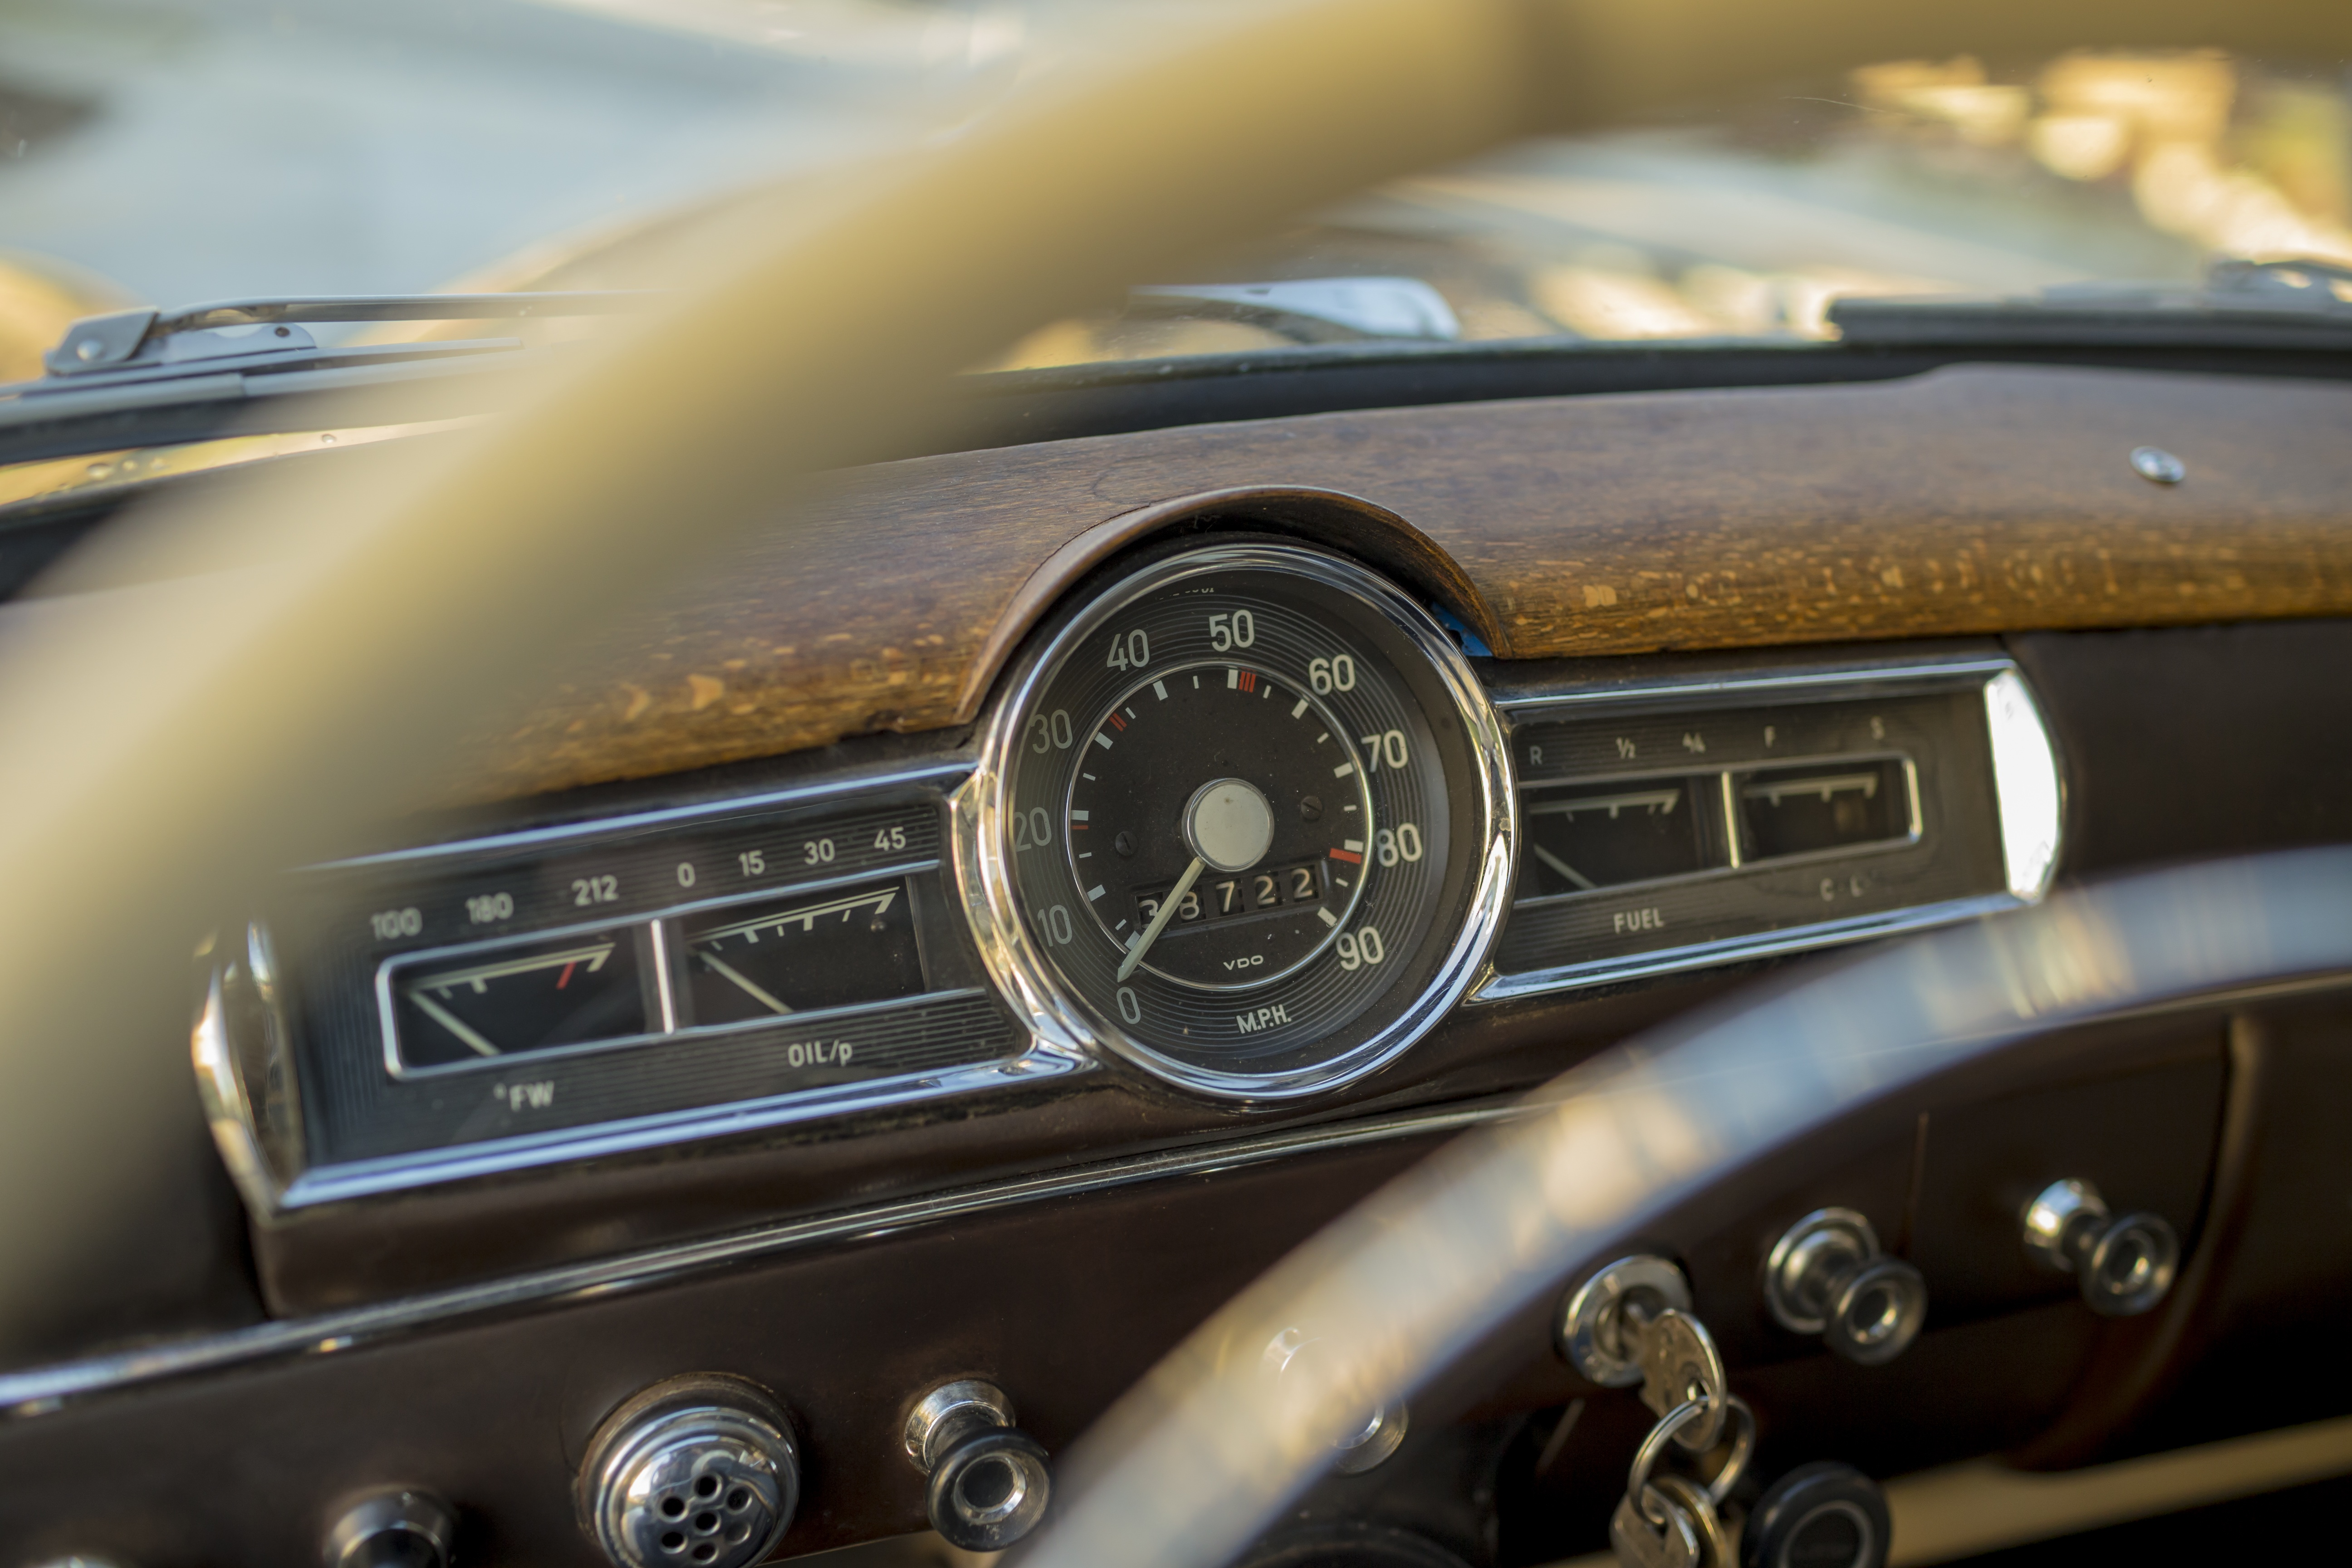 Speed, Car, Control, Luxury, Race, HQ Photo